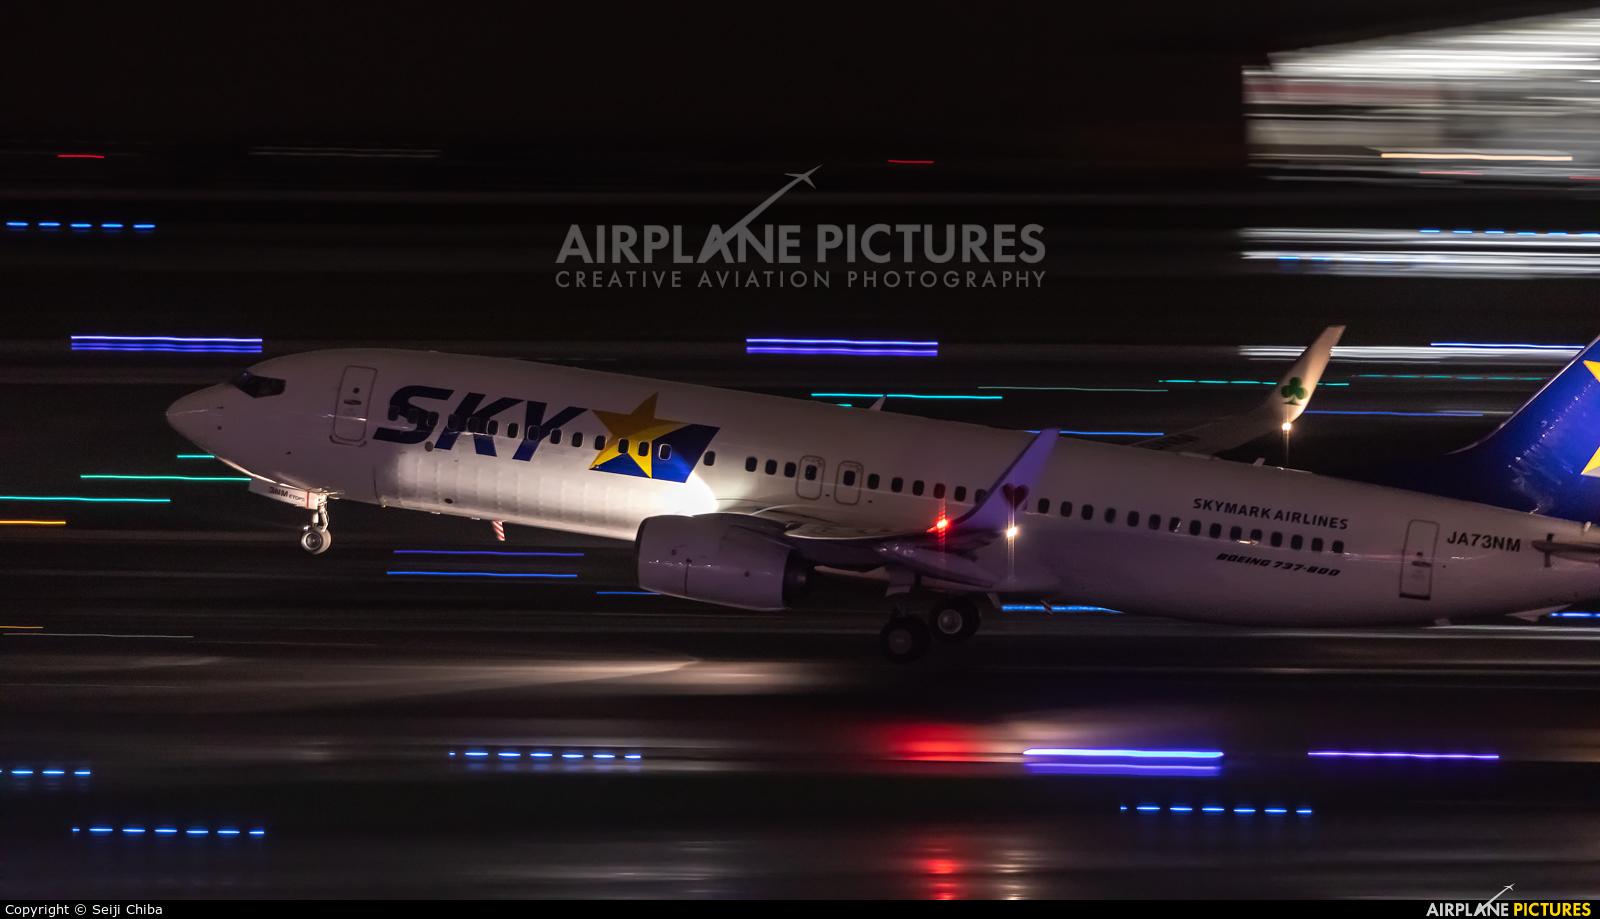 Skymark Airlines JA73NM aircraft at Tokyo - Haneda Intl